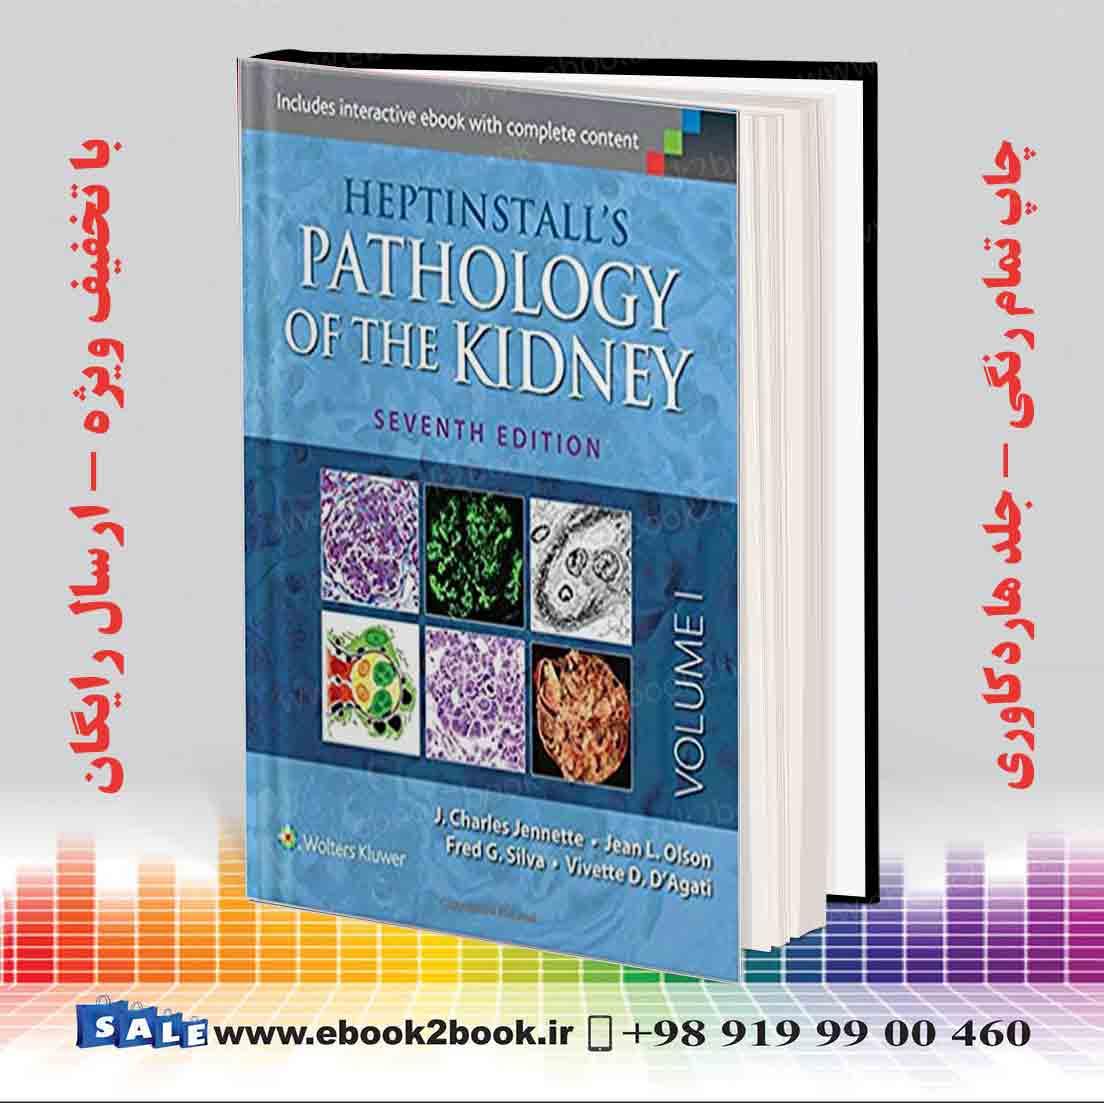 heptinstall pathology of the kidney